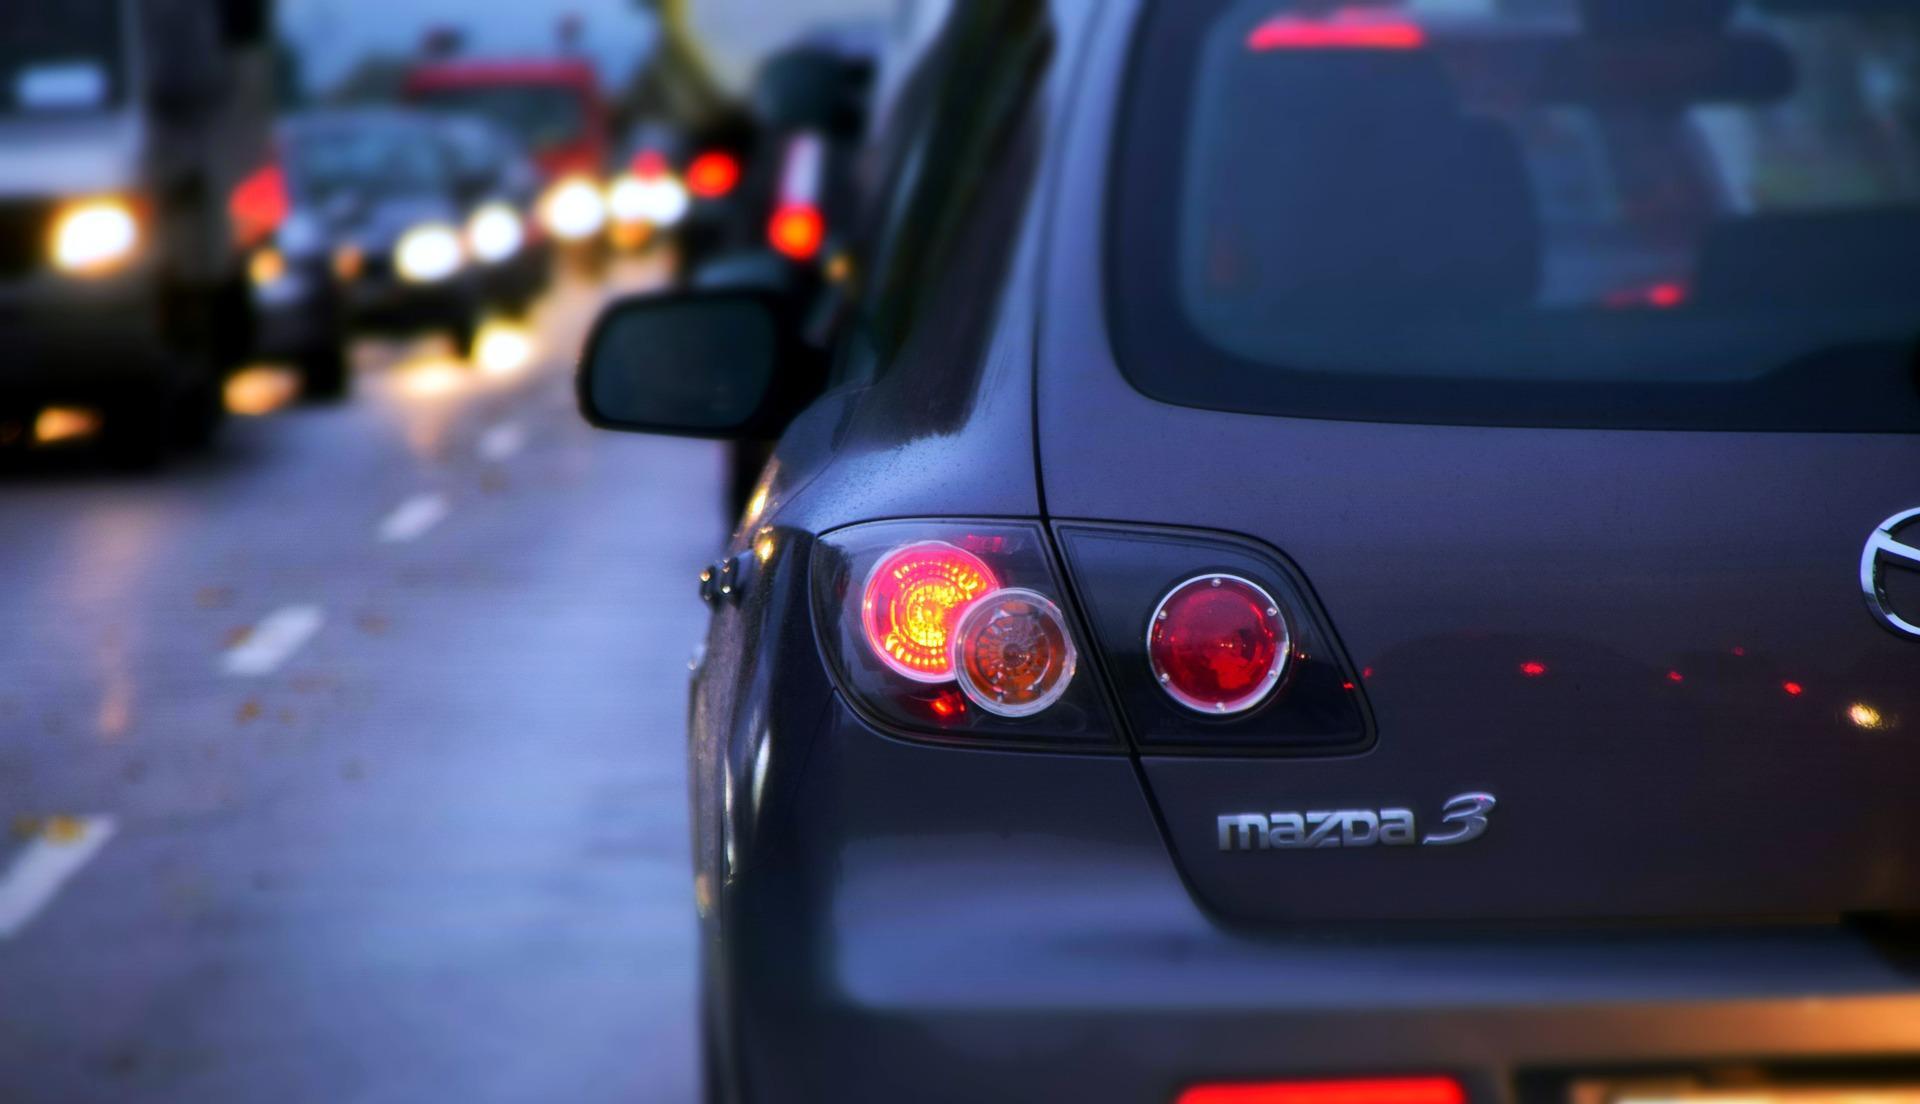 Kettingbotsing met 7 auto's op snelweg A5, verbindingsweg A4 dicht